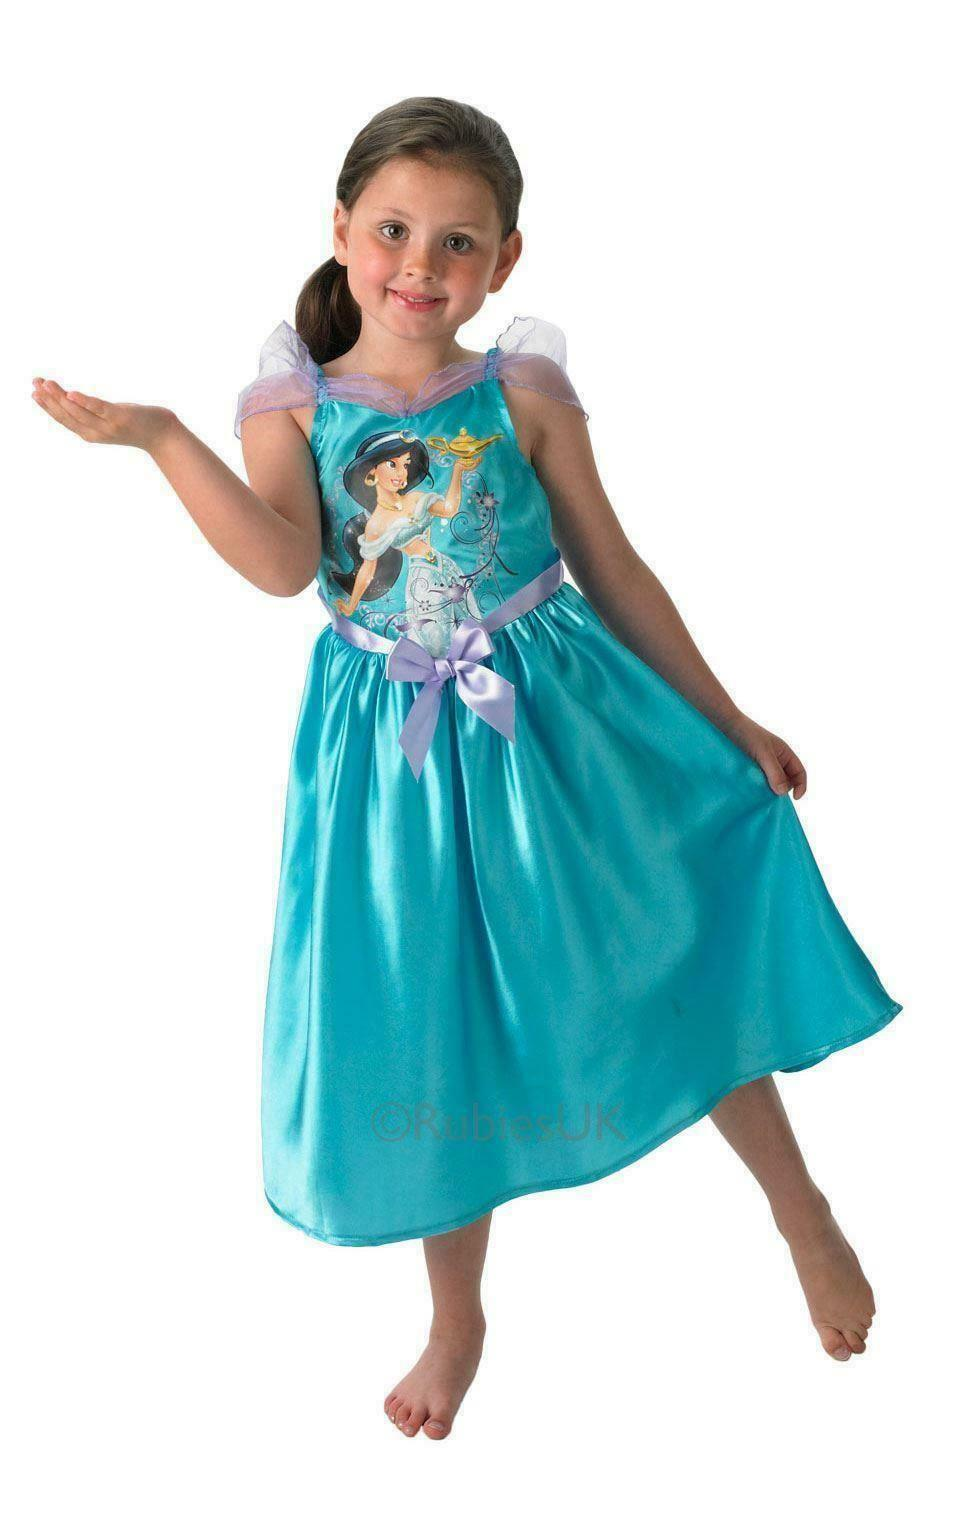 Rubies Official Disney Princess Jasmine Story Time Costume